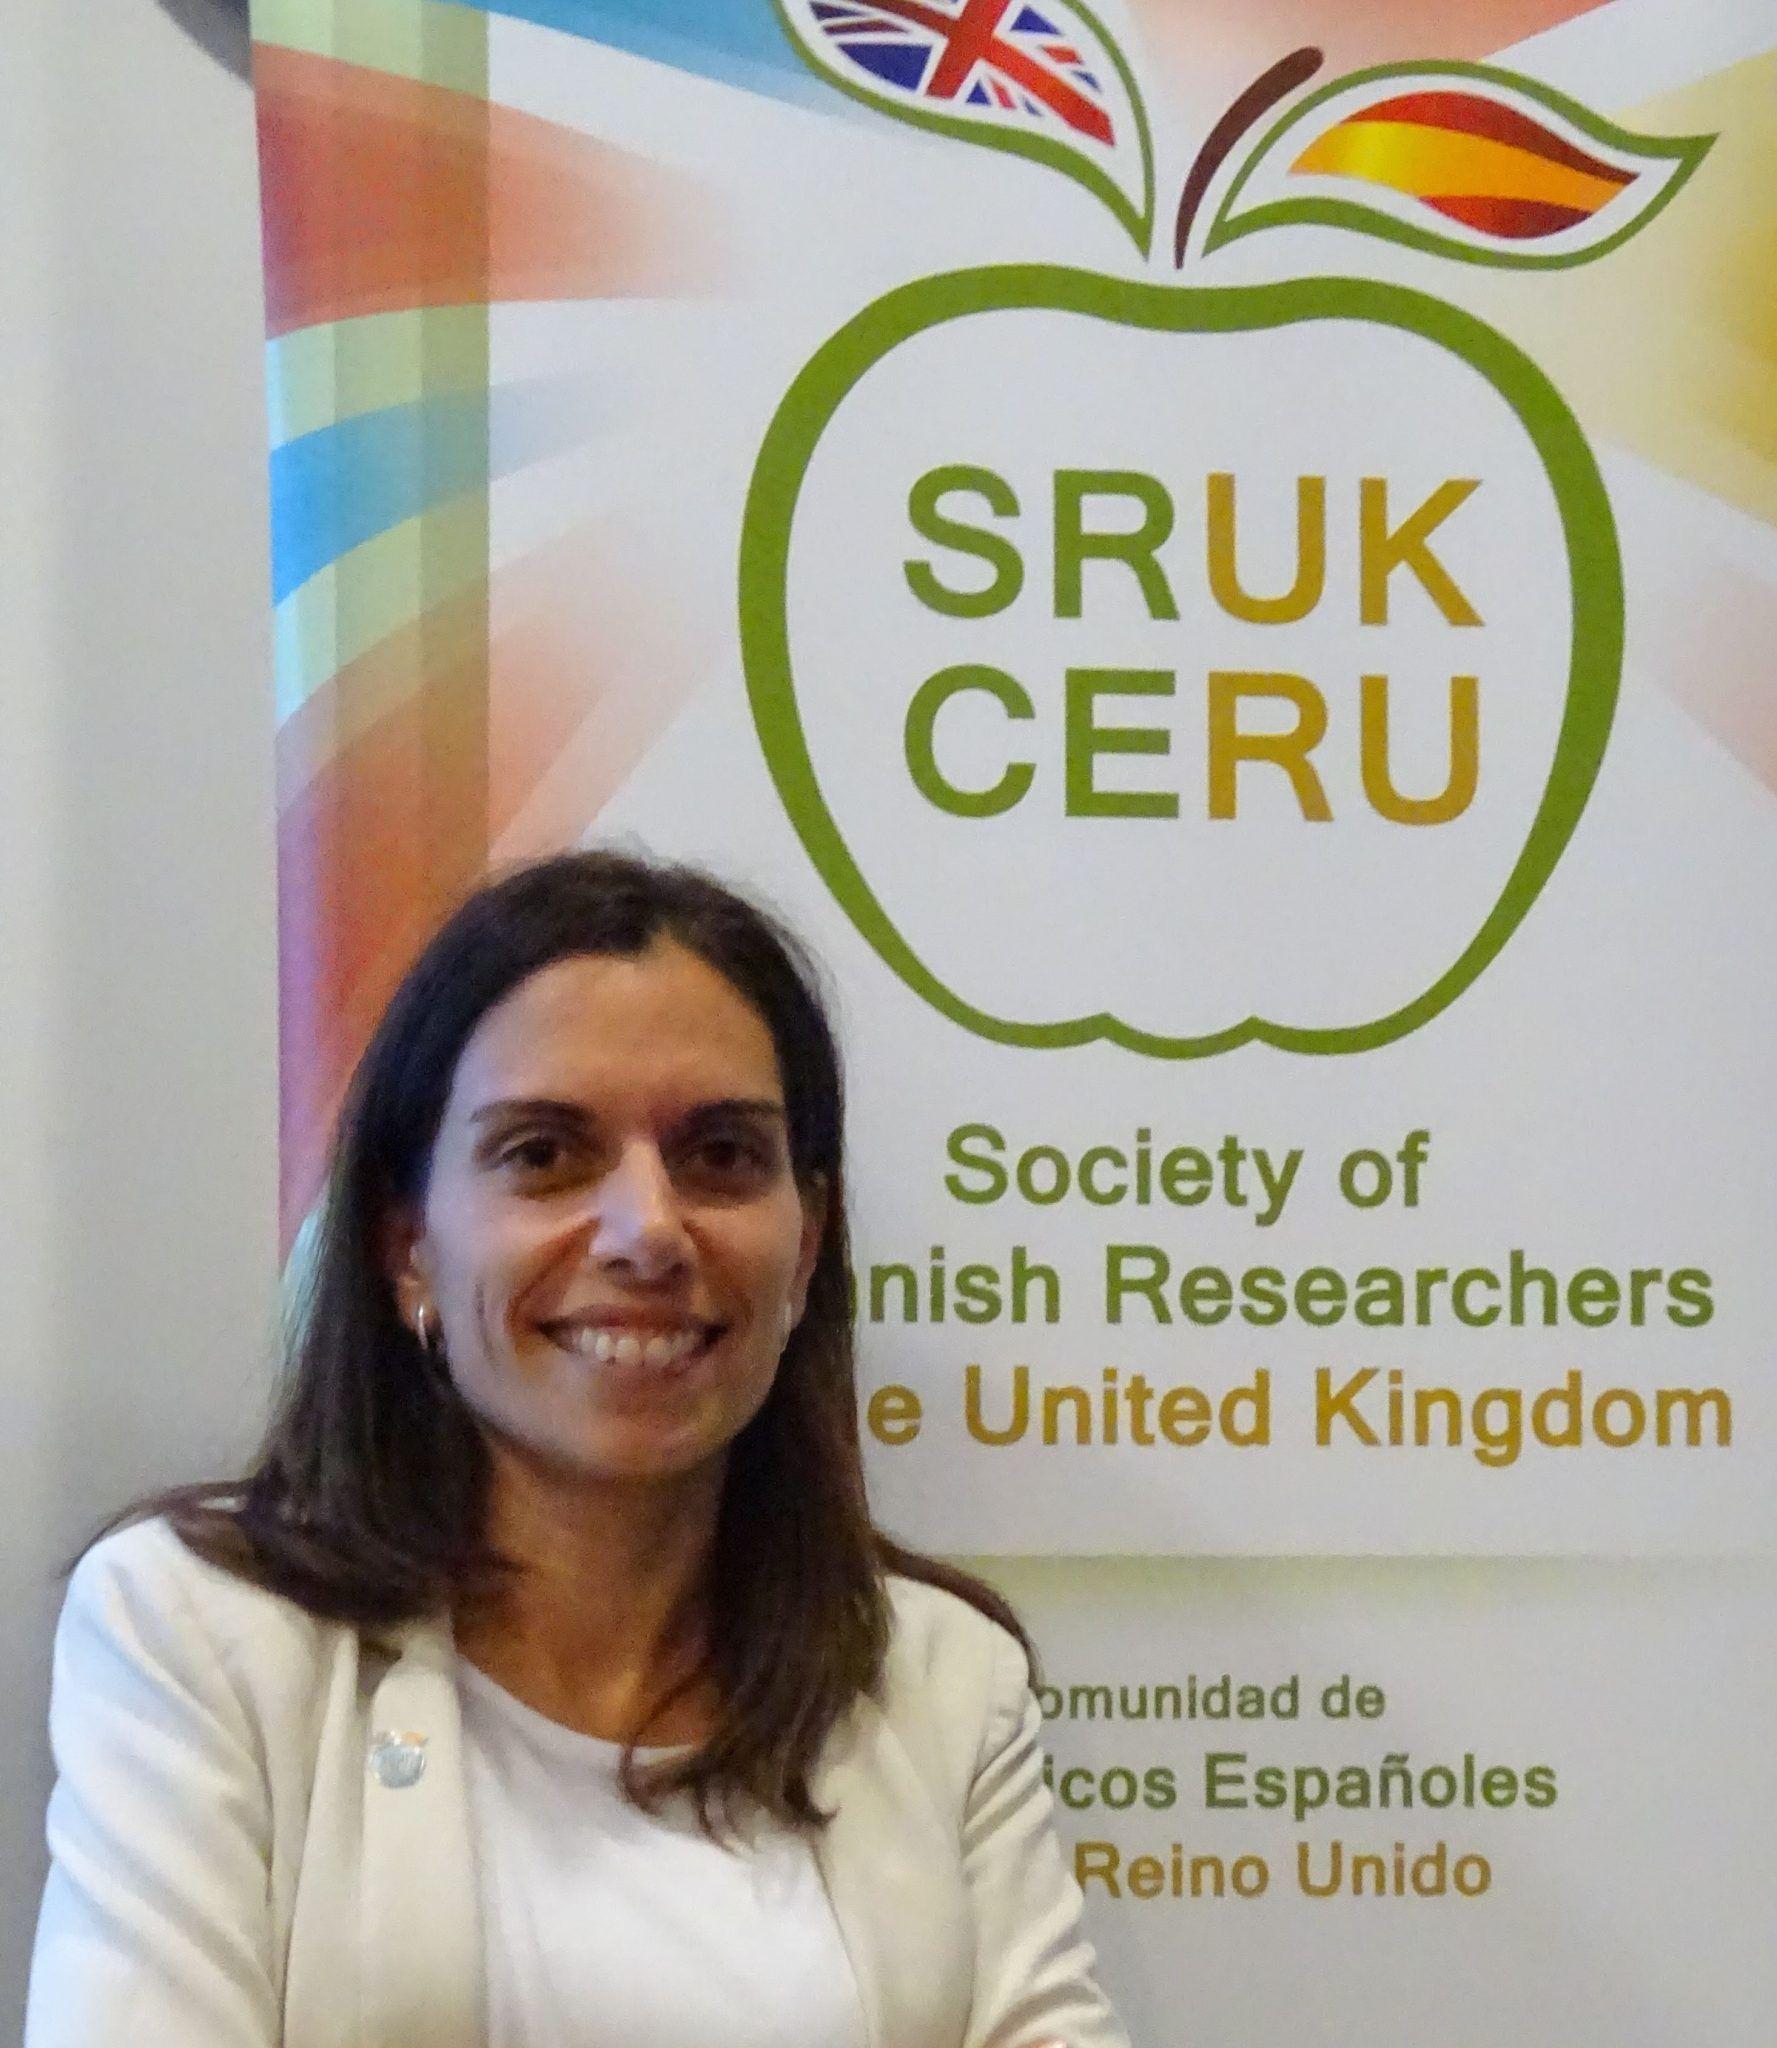 María Jiménez Sánchez, presidenta de SRUK/CERU e investigadora principal en el King's College London. Imagen: SRUK-CERU.